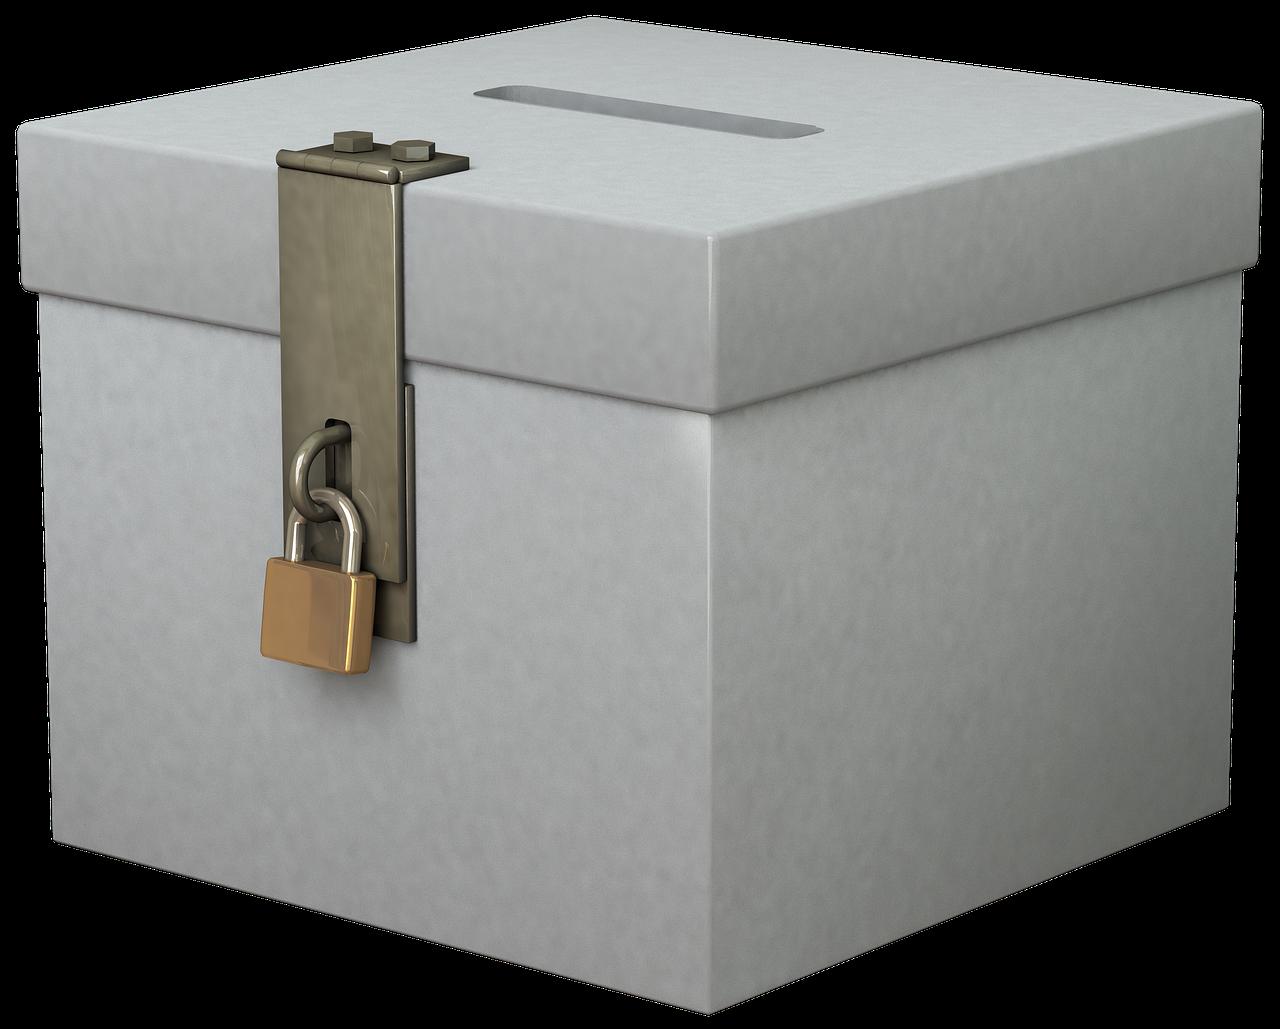 ballot-box-2586565_1280